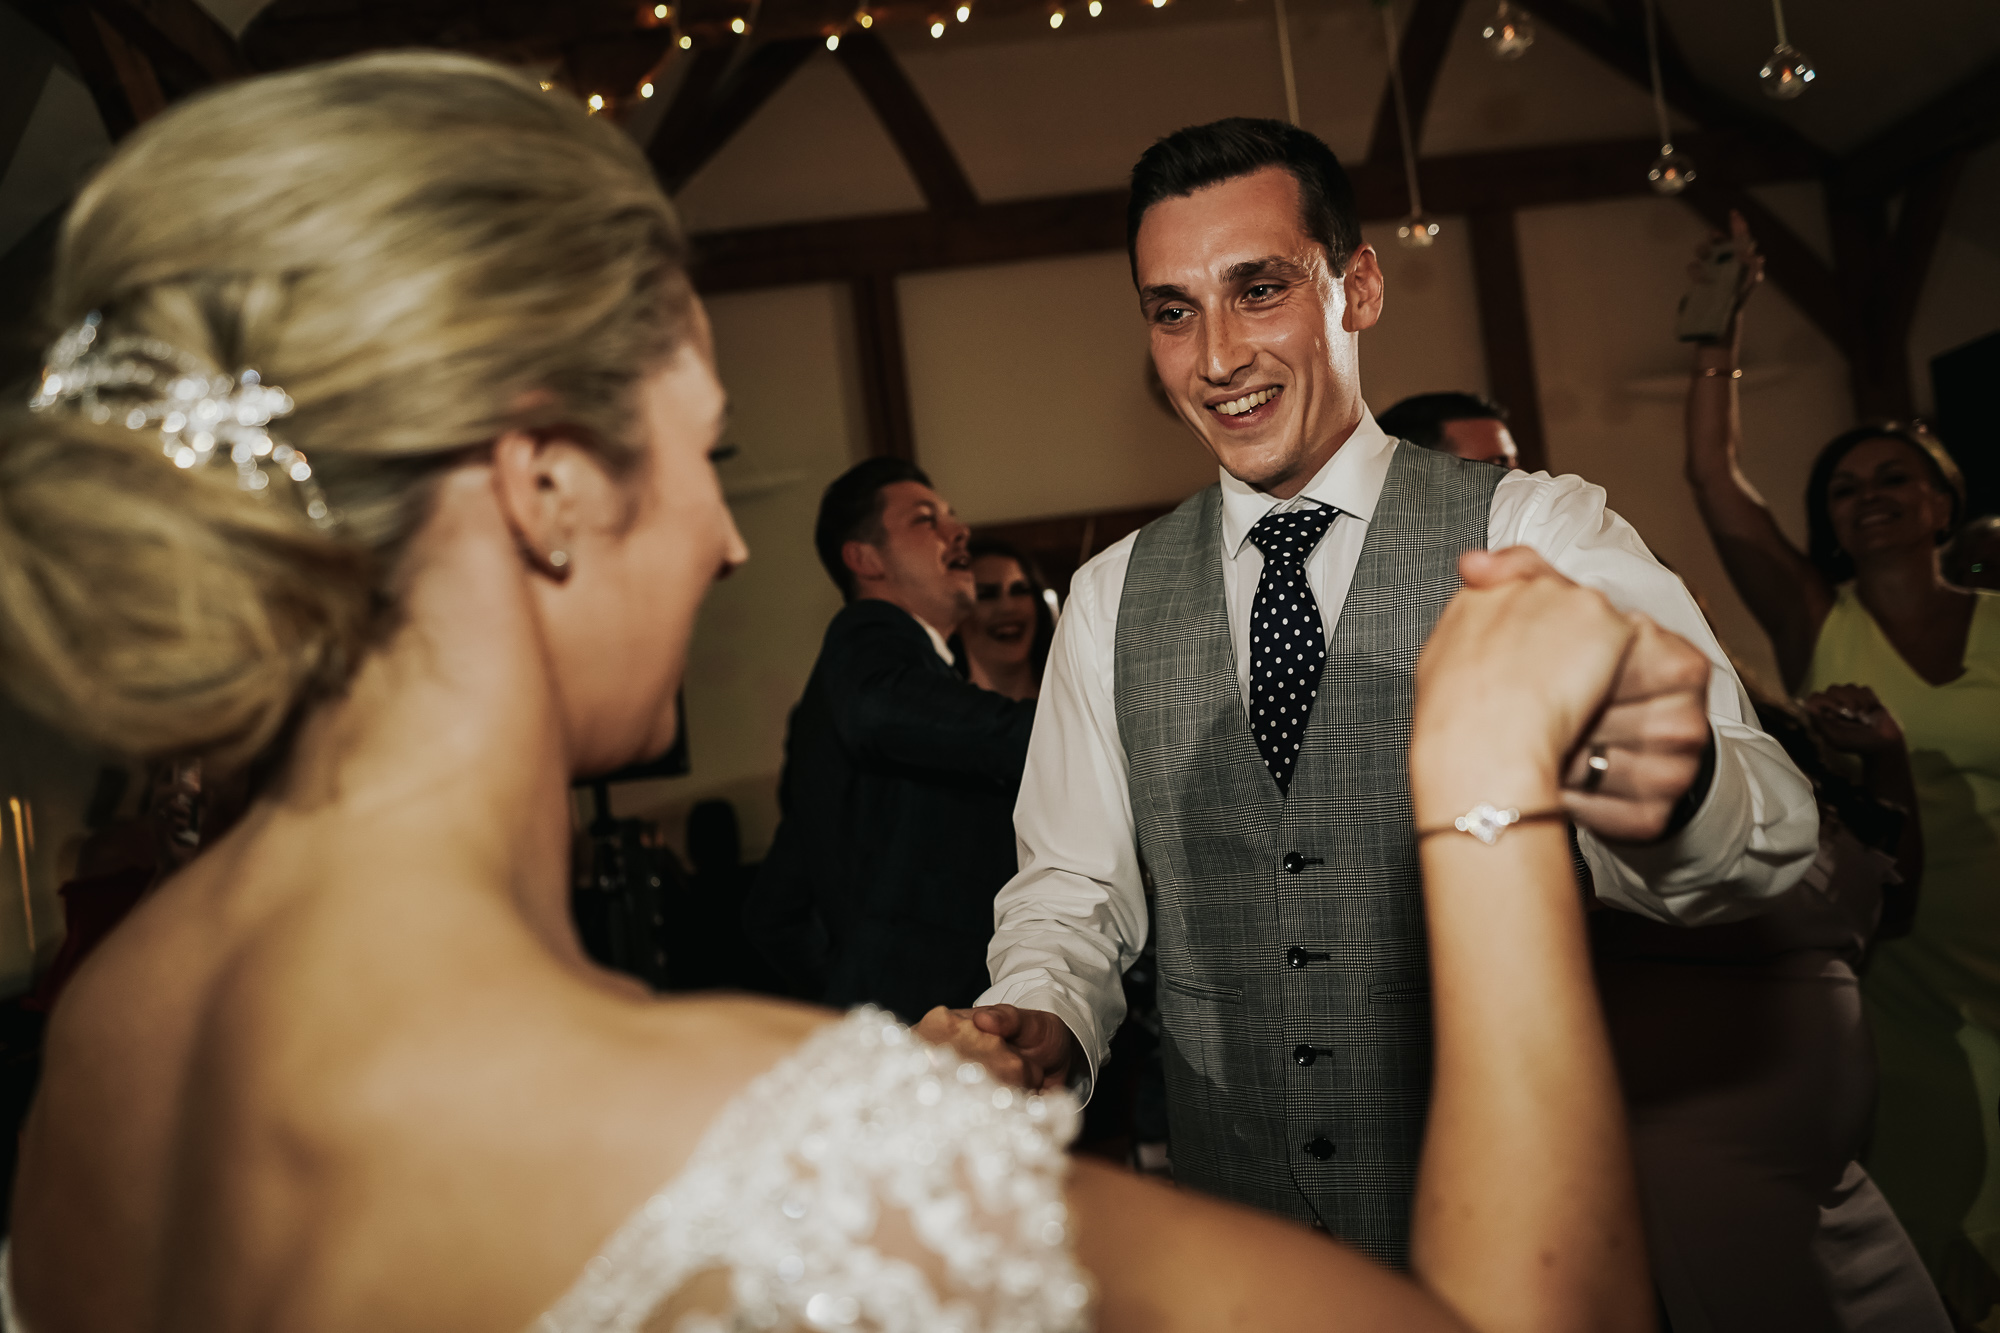 Sandhole Oak Barn Wedding Photography cheshire wedding photographer (52 of 56).jpg